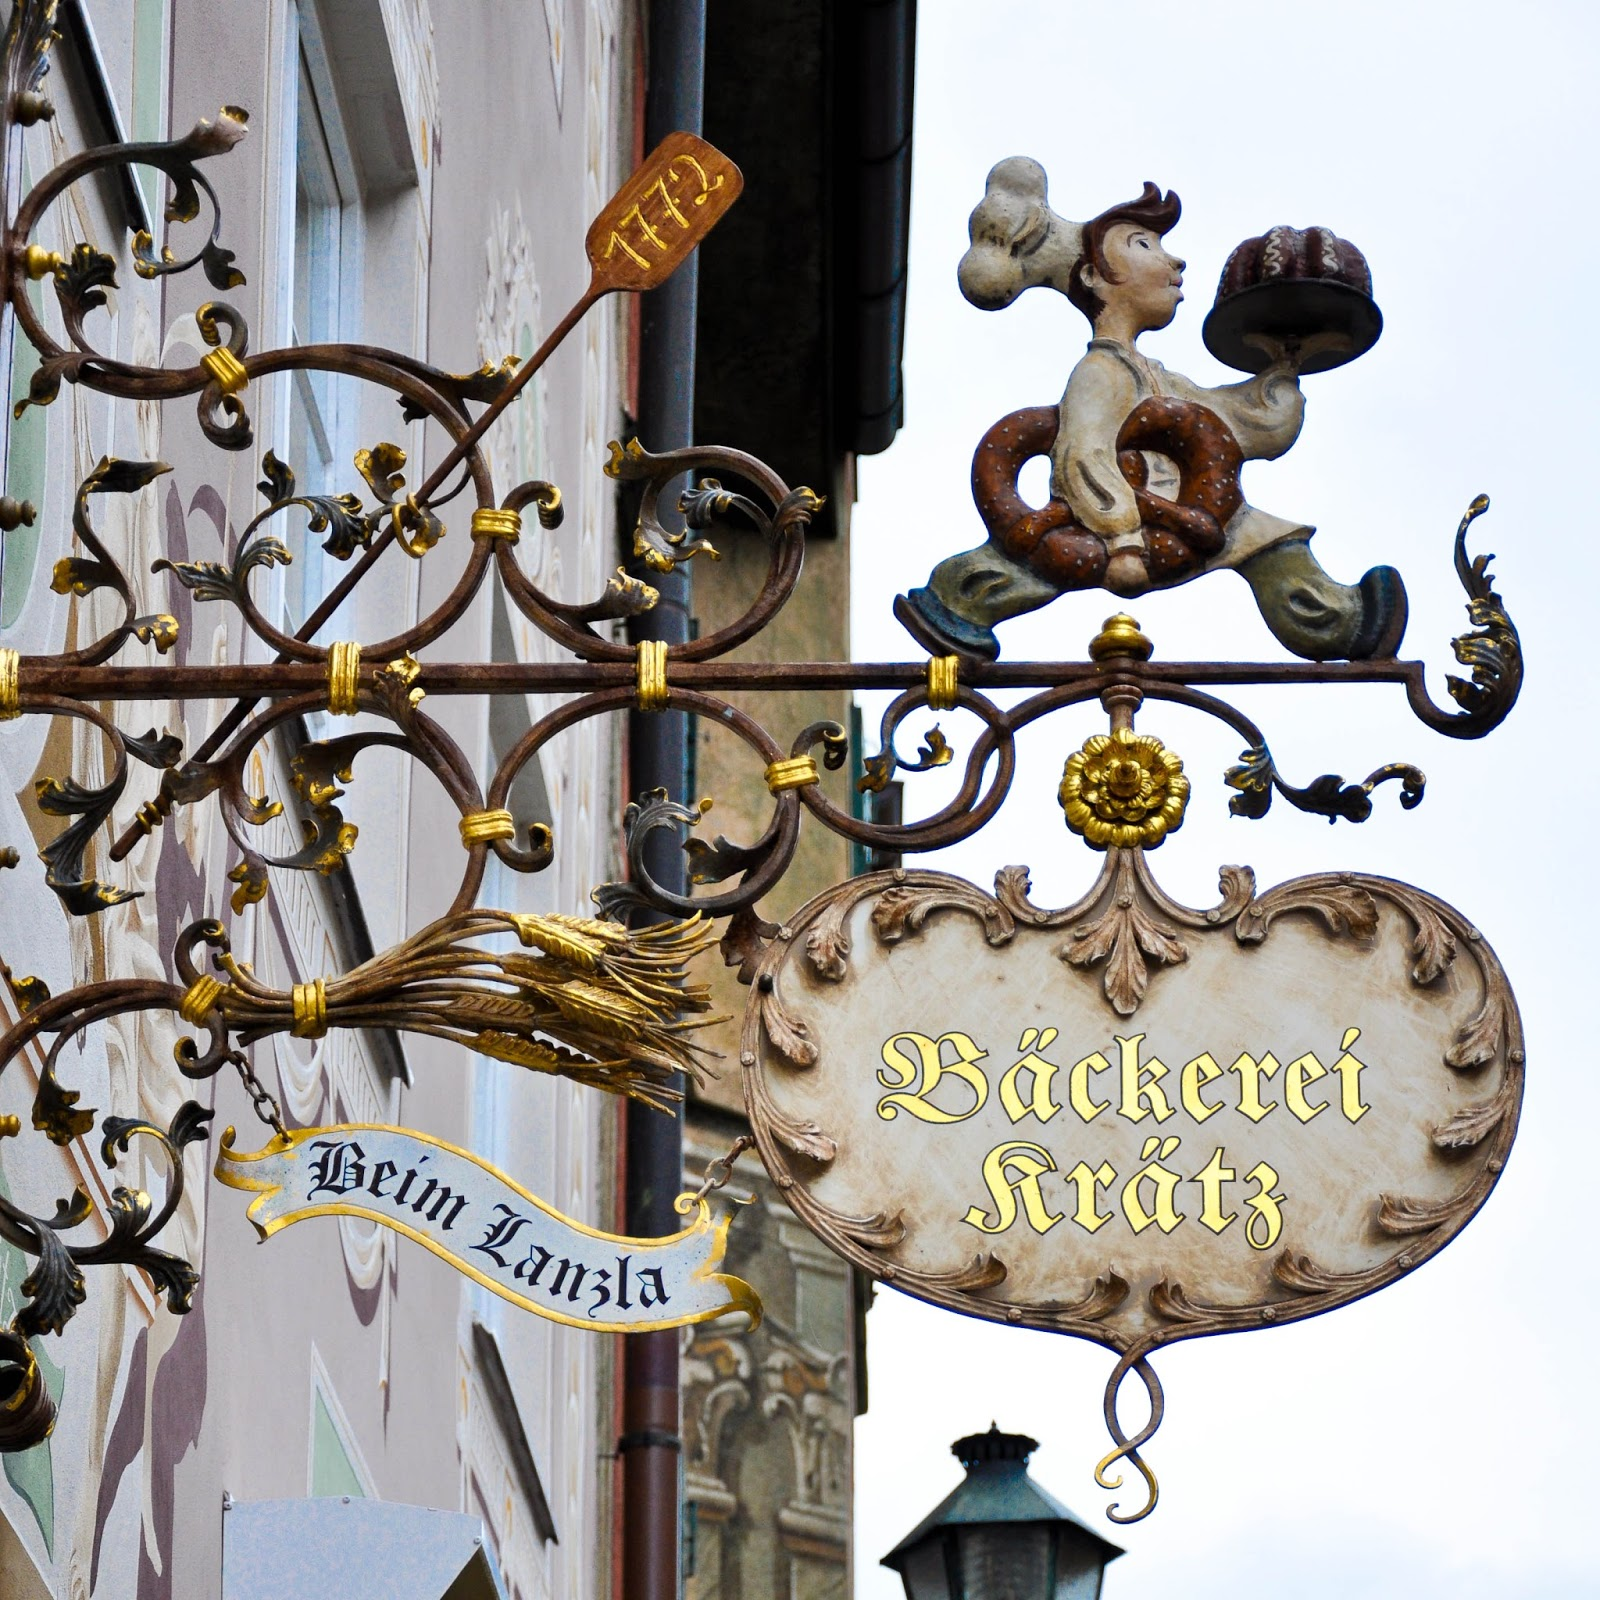 Bakery Shop Sign, Garmisch-Parternkirchen, Bavaria, Germany